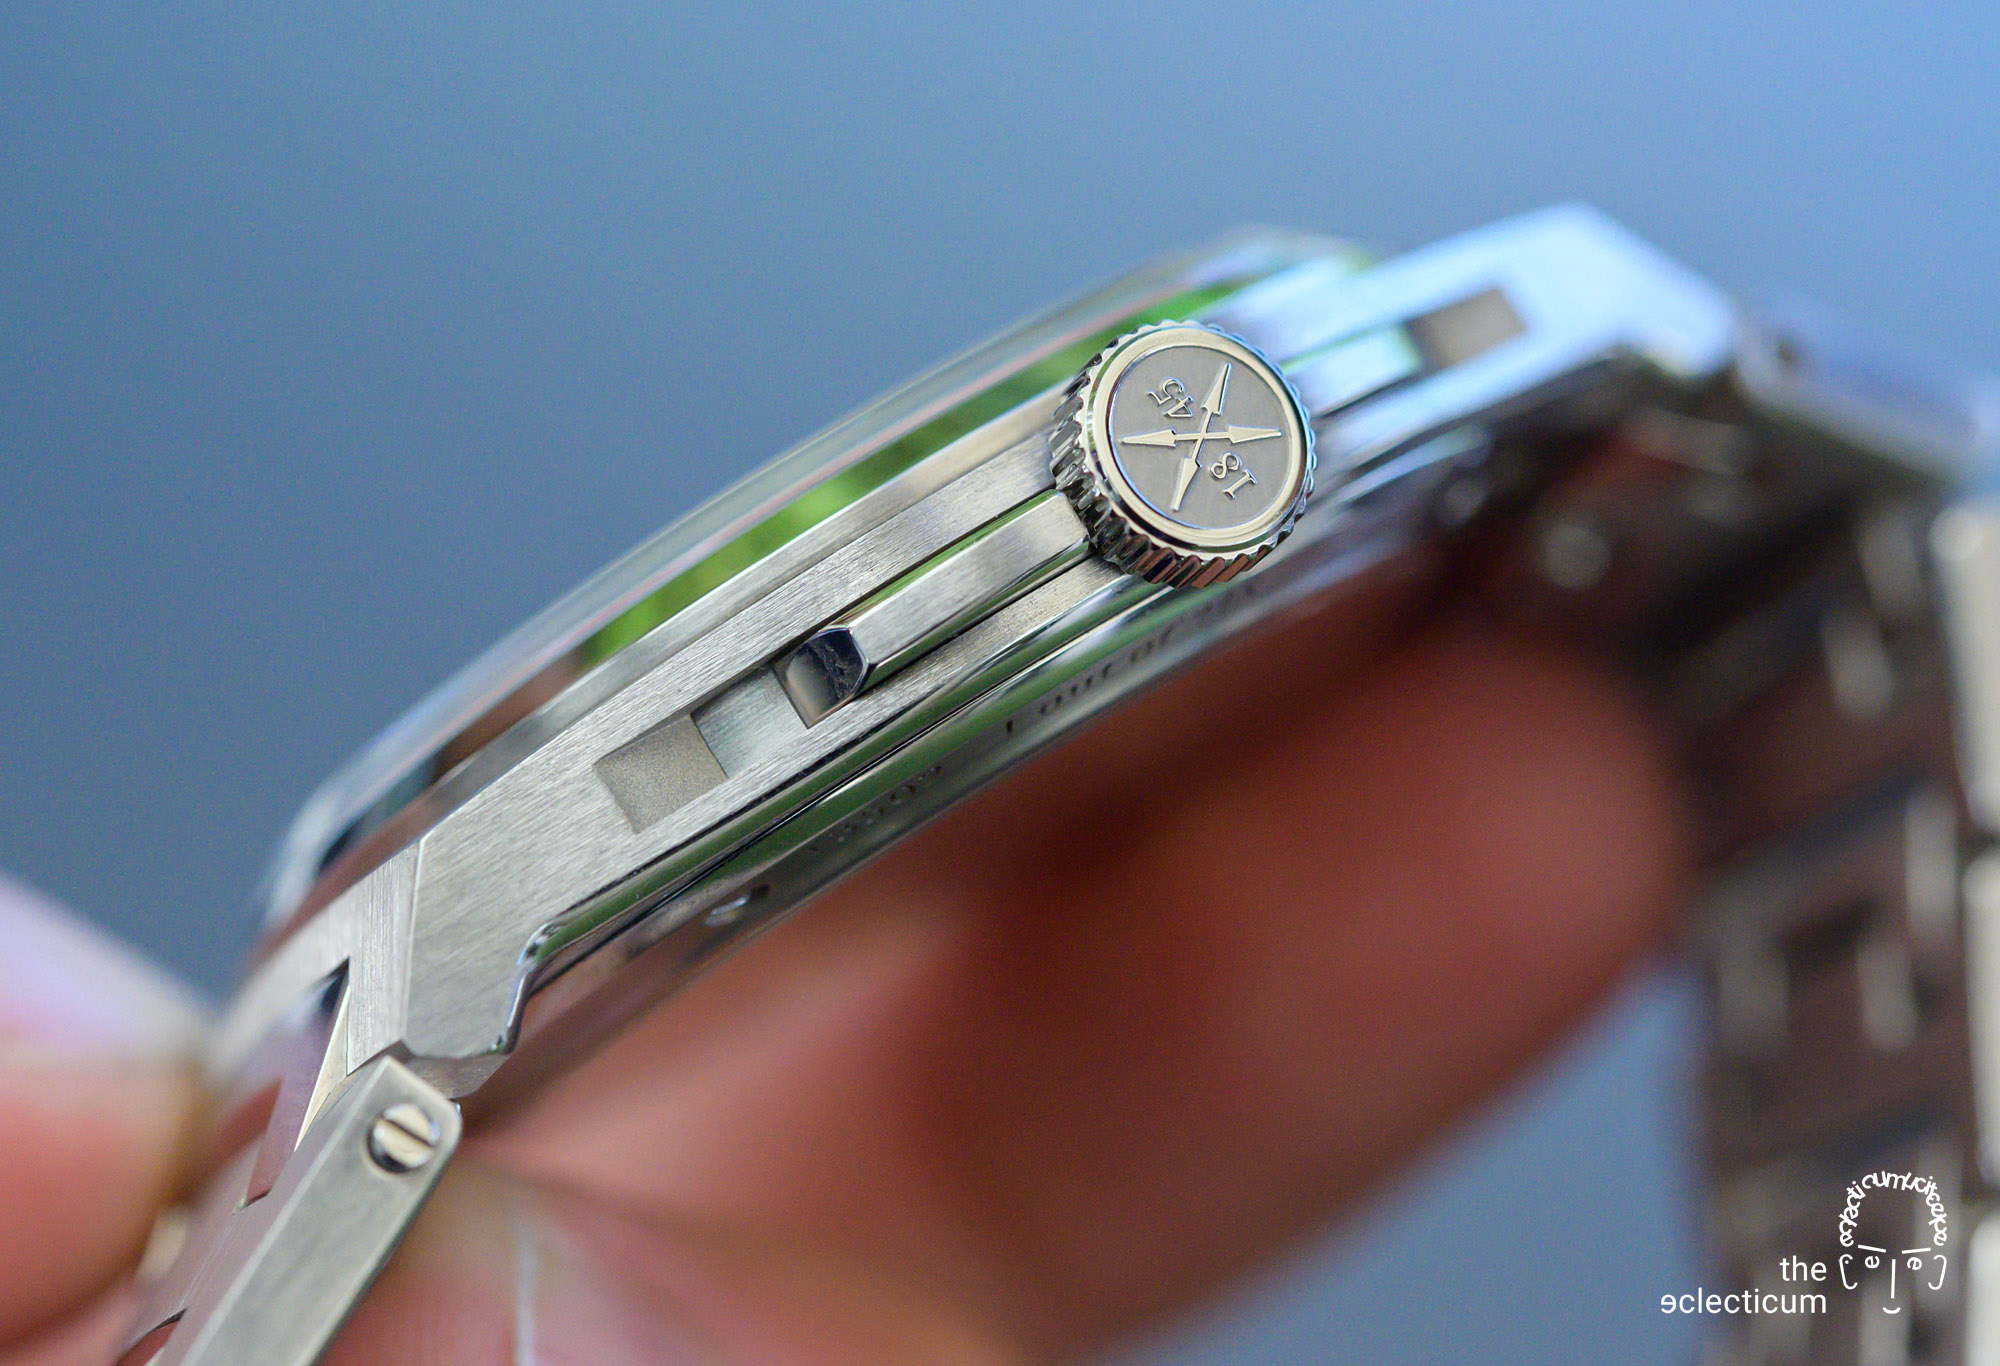 Czapek & Cie Antarctique stainless steel sports watch